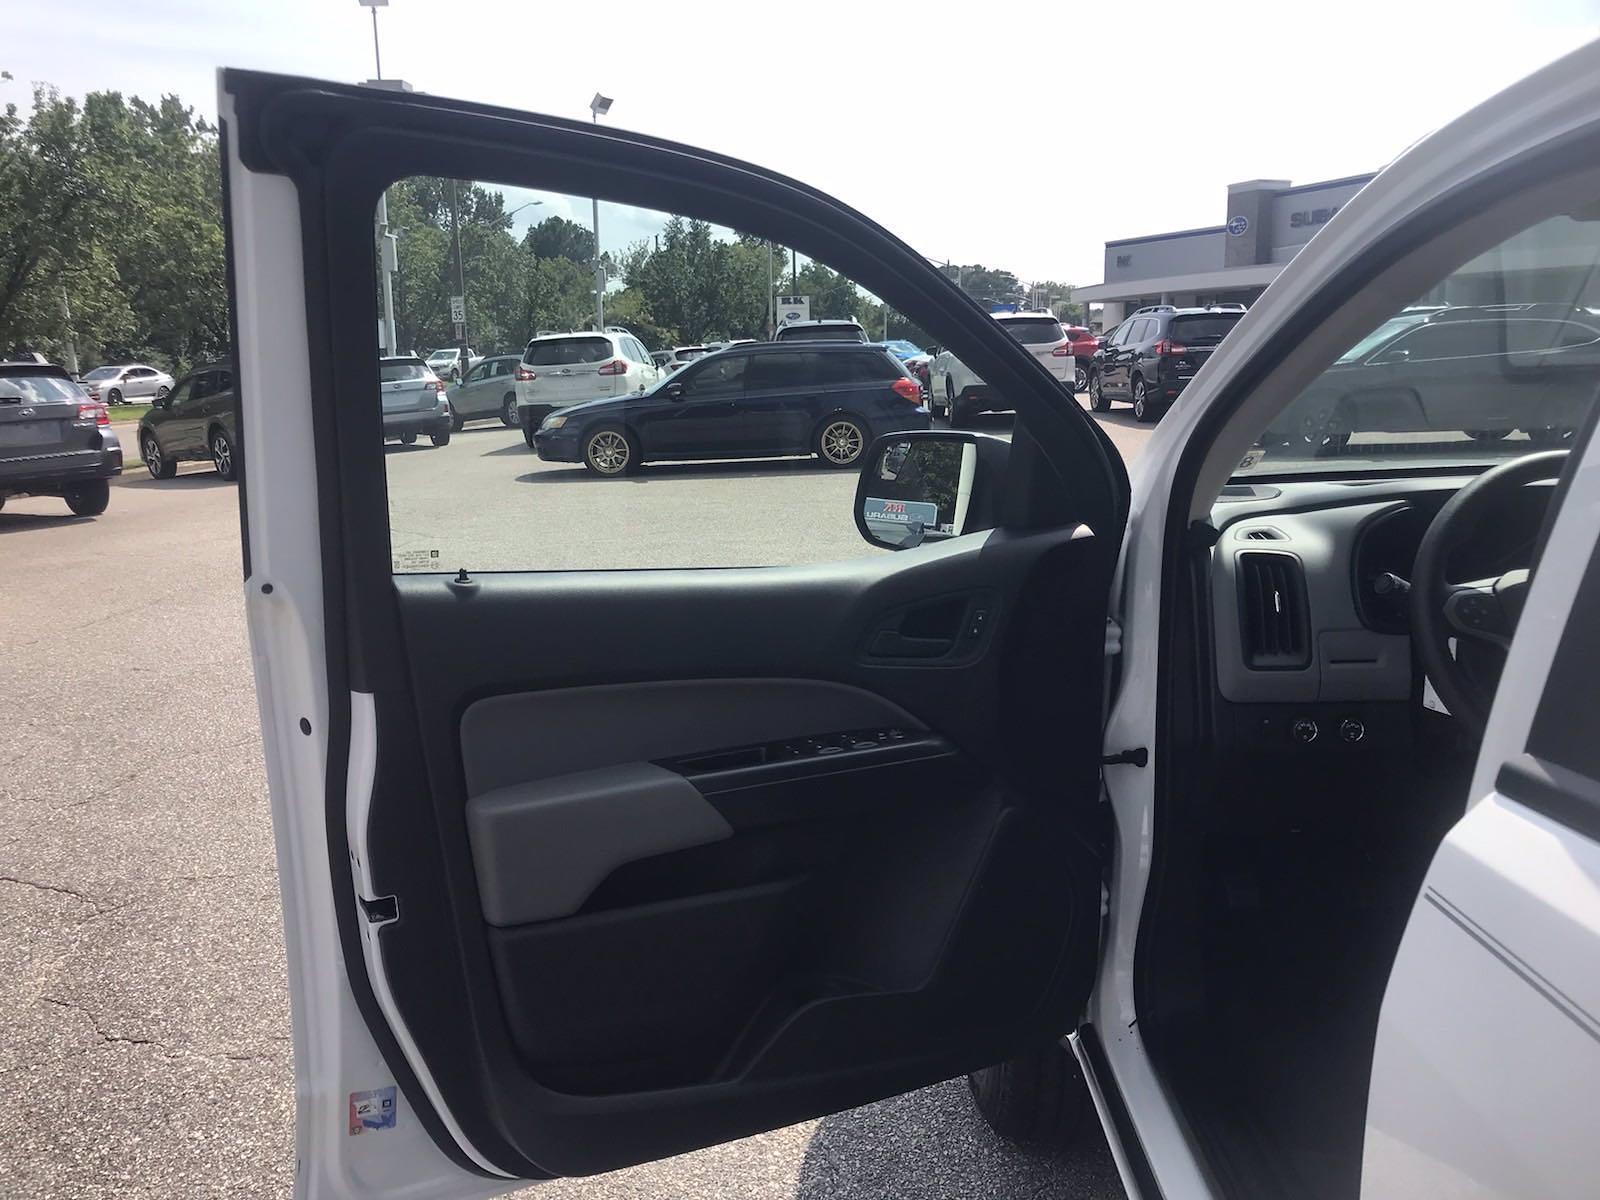 2021 Colorado Crew Cab 4x4,  Pickup #218045 - photo 19